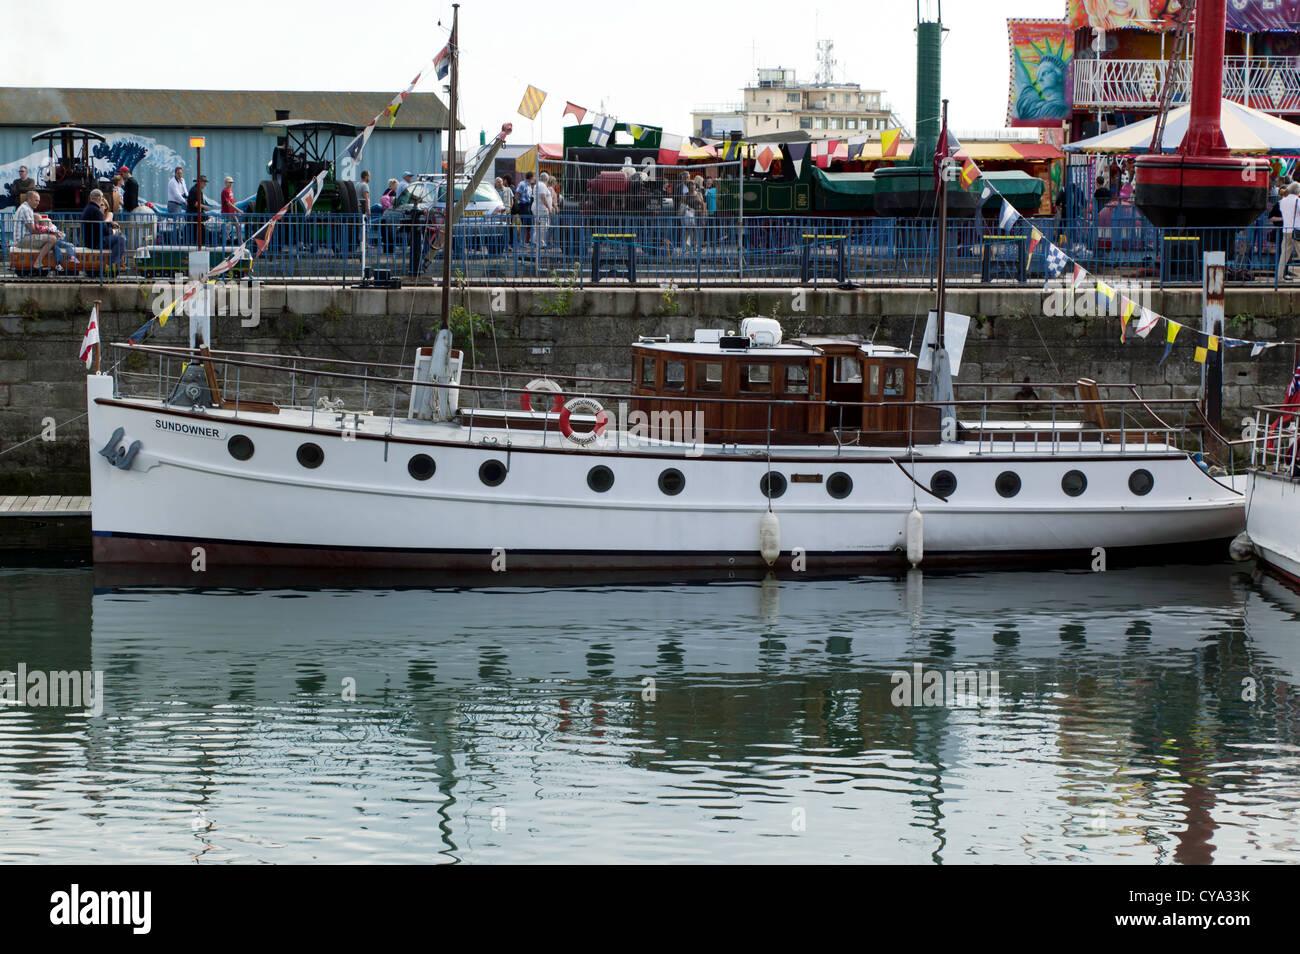 Image of the 'Sundowner', moored up outside the Ramsgate Maritime Museum,  Ramsgate, Kent - Stock Image